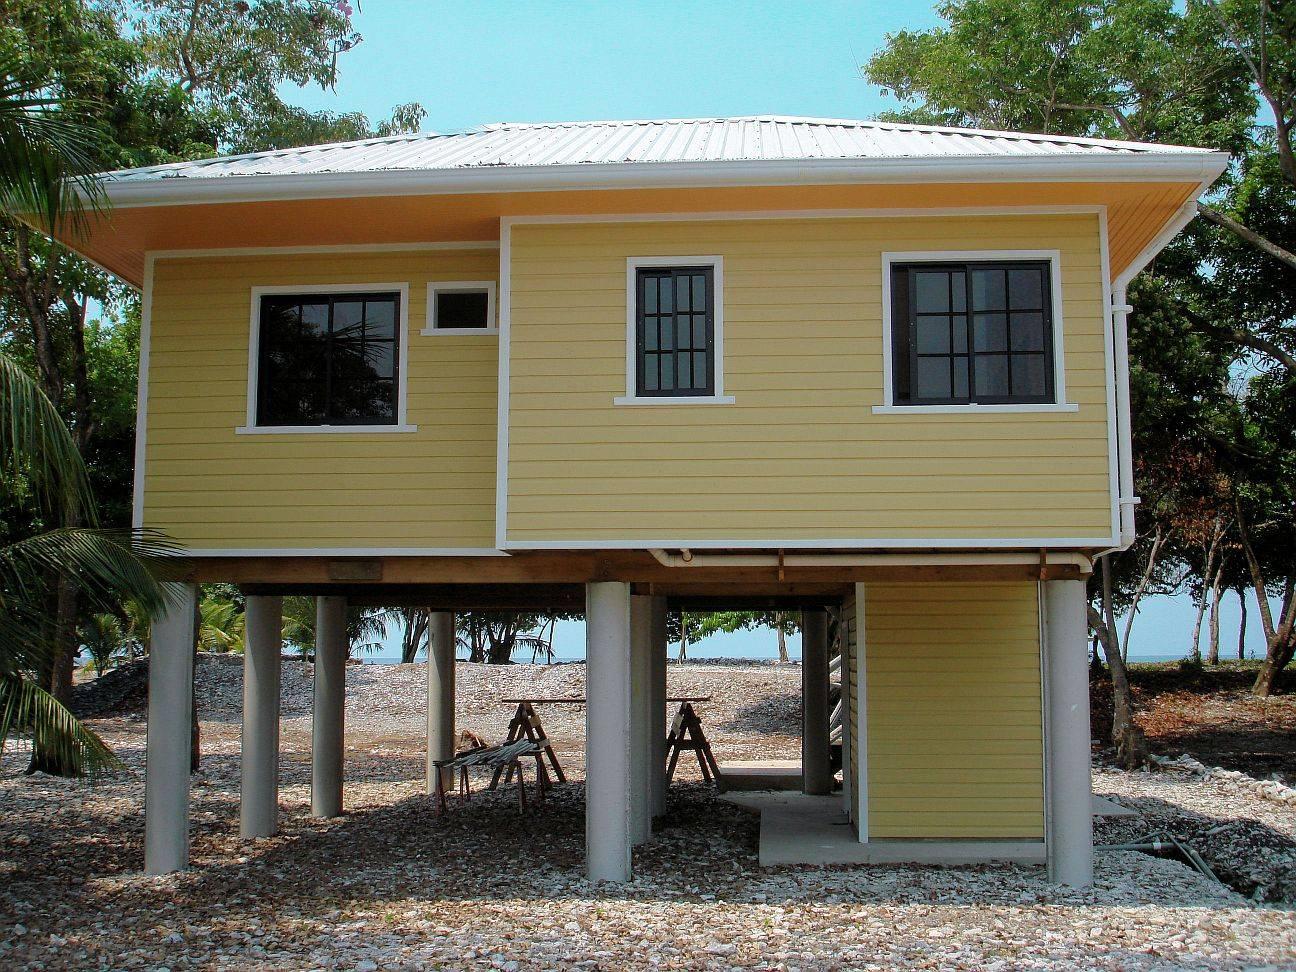 Caribbean Style House Plans - Caribbean homes designs